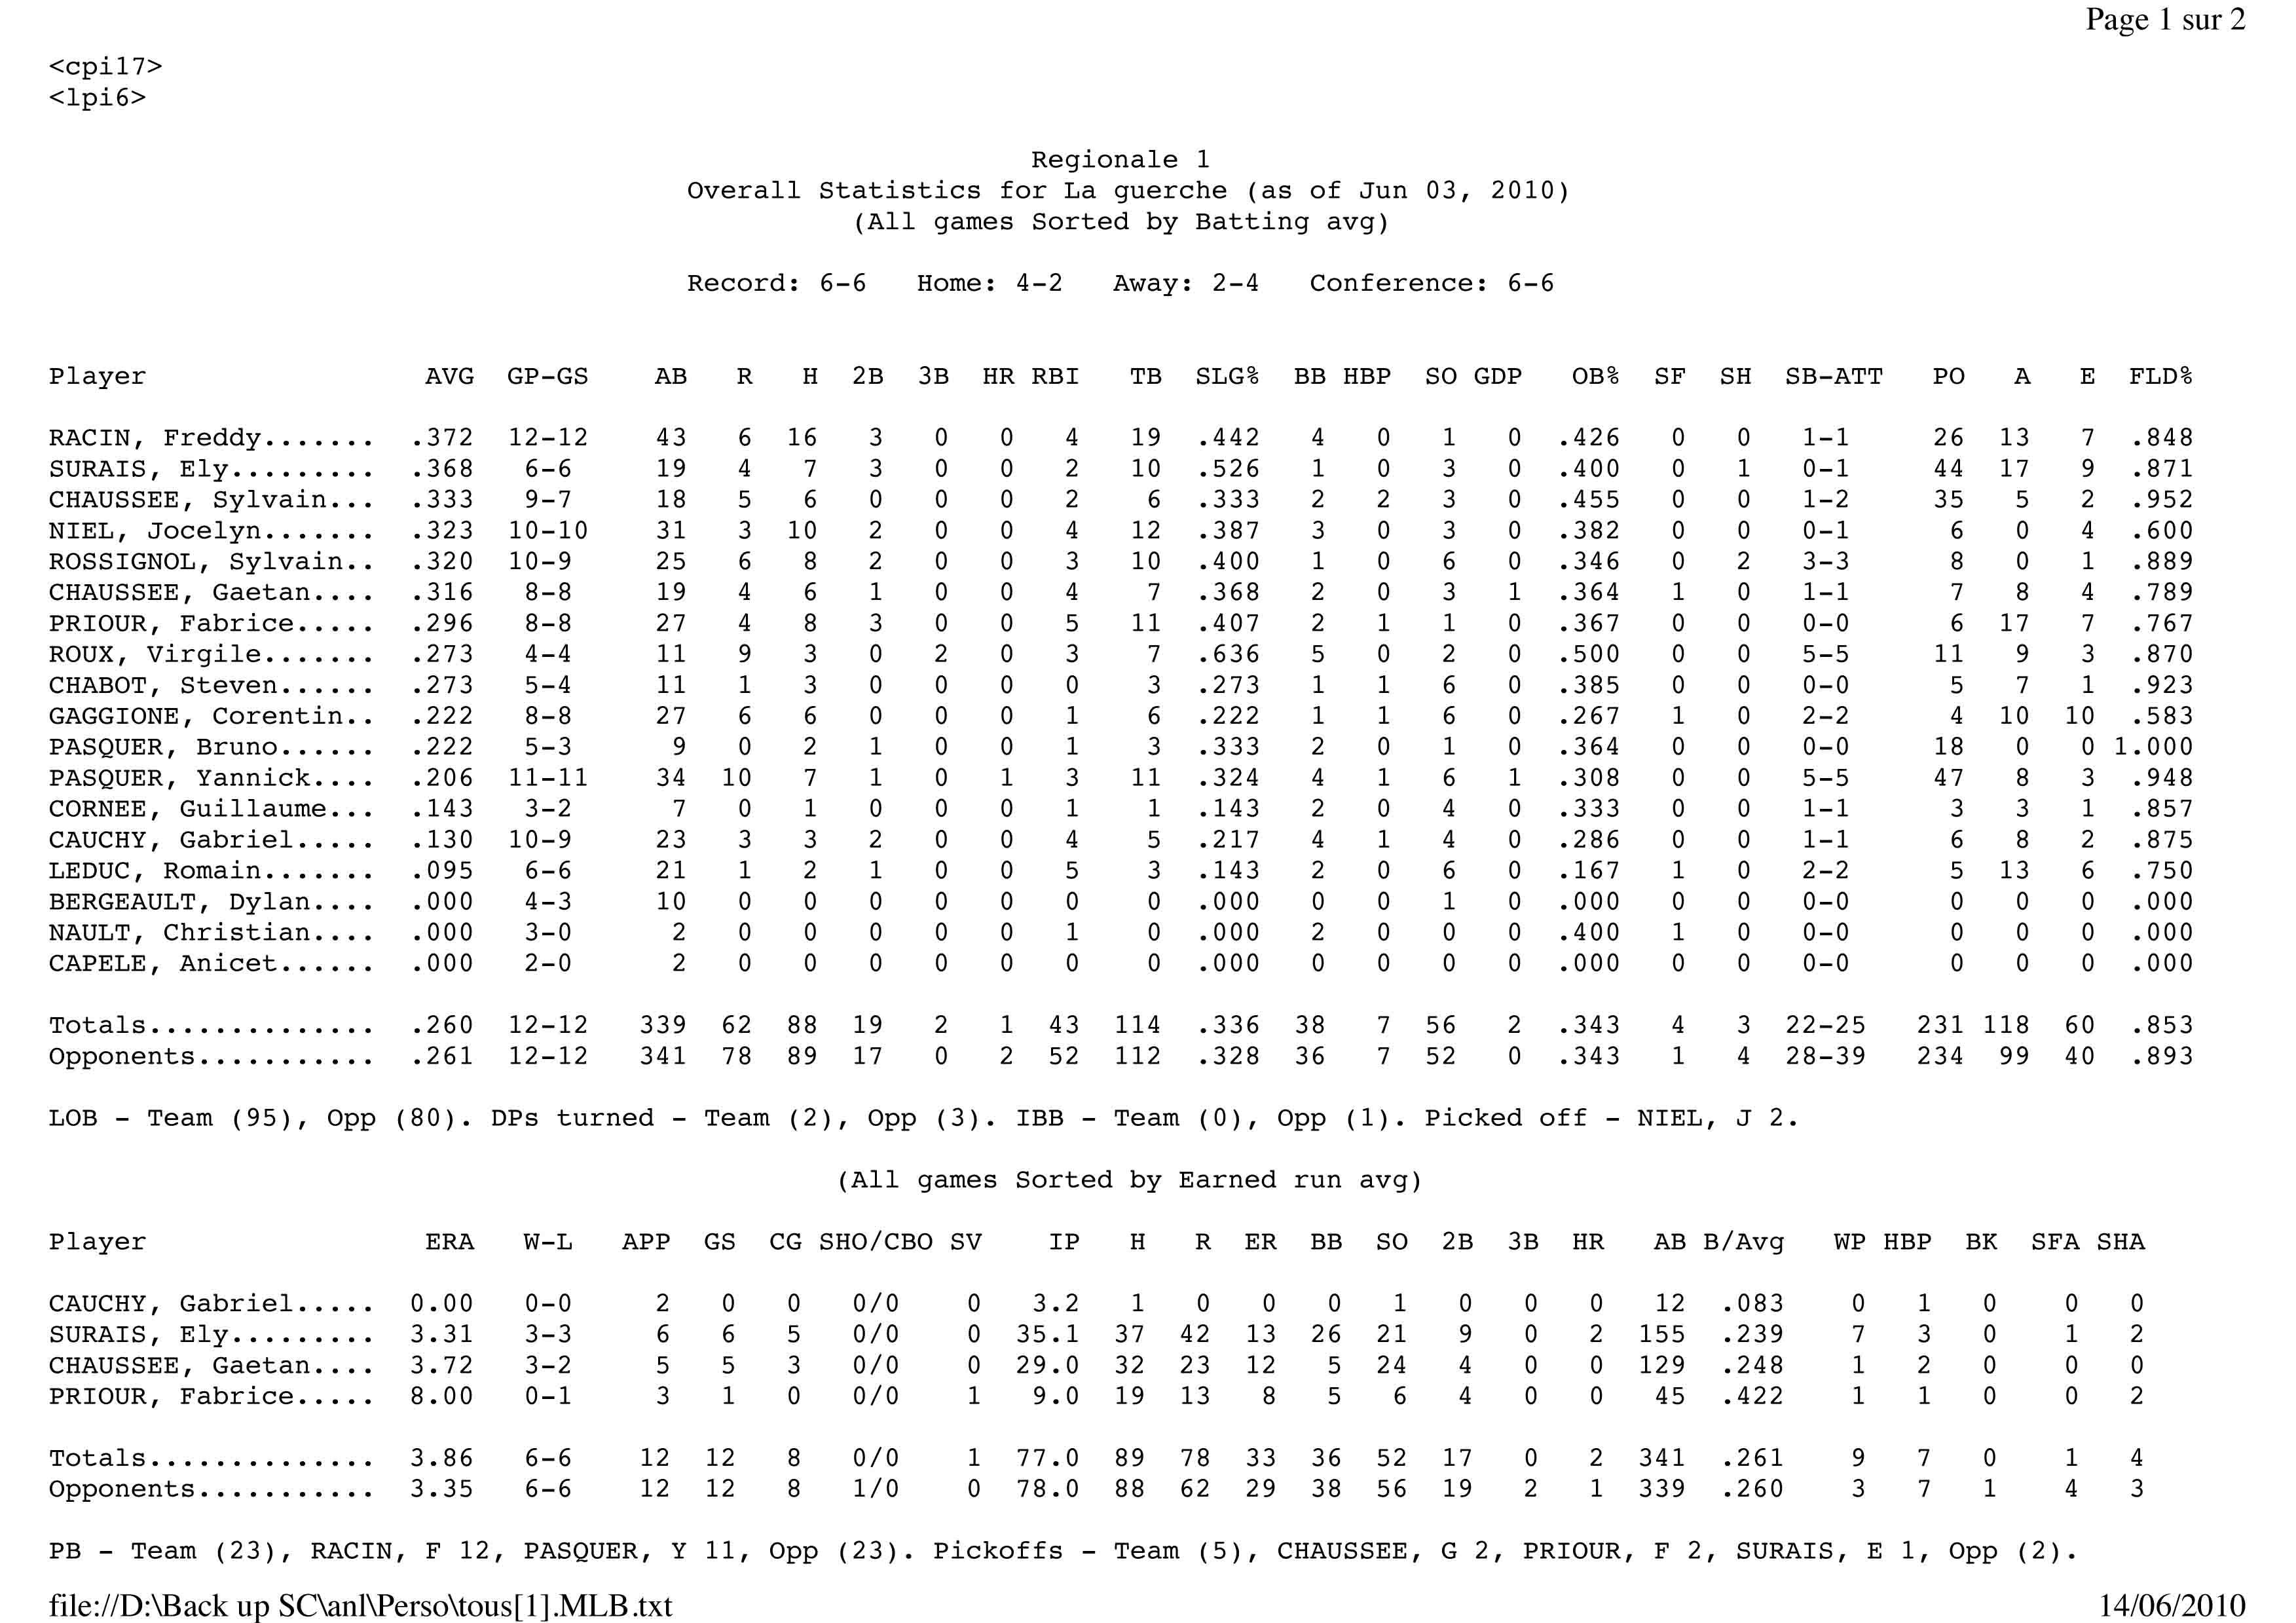 Statistique Hawks 2010